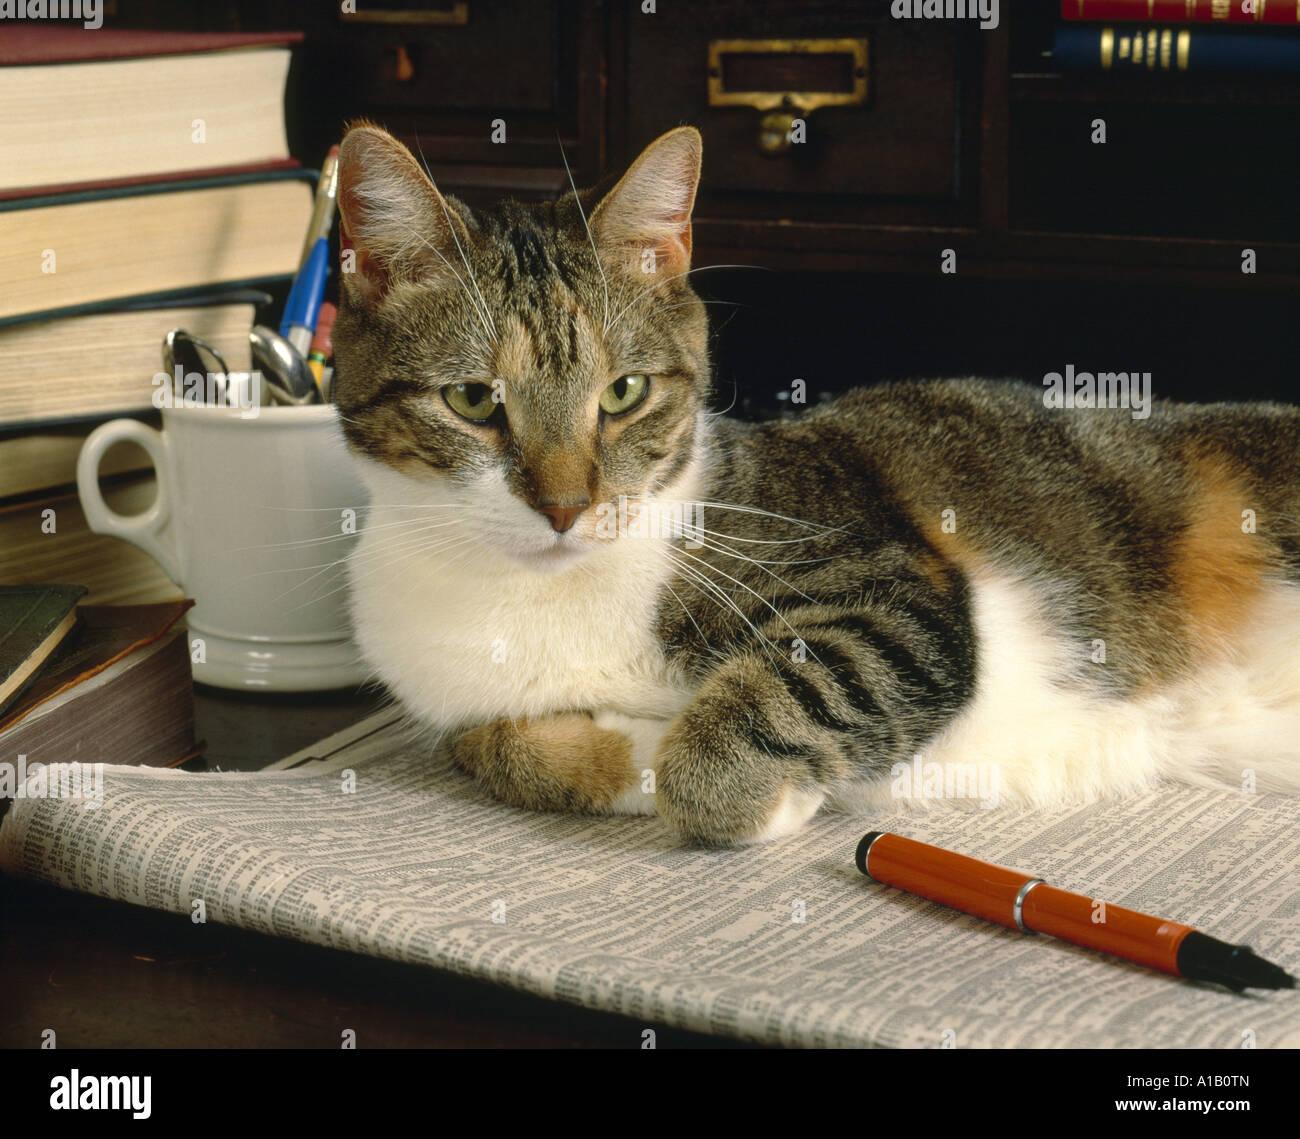 Cat With Book Stockfotos & Cat With Book Bilder - Alamy